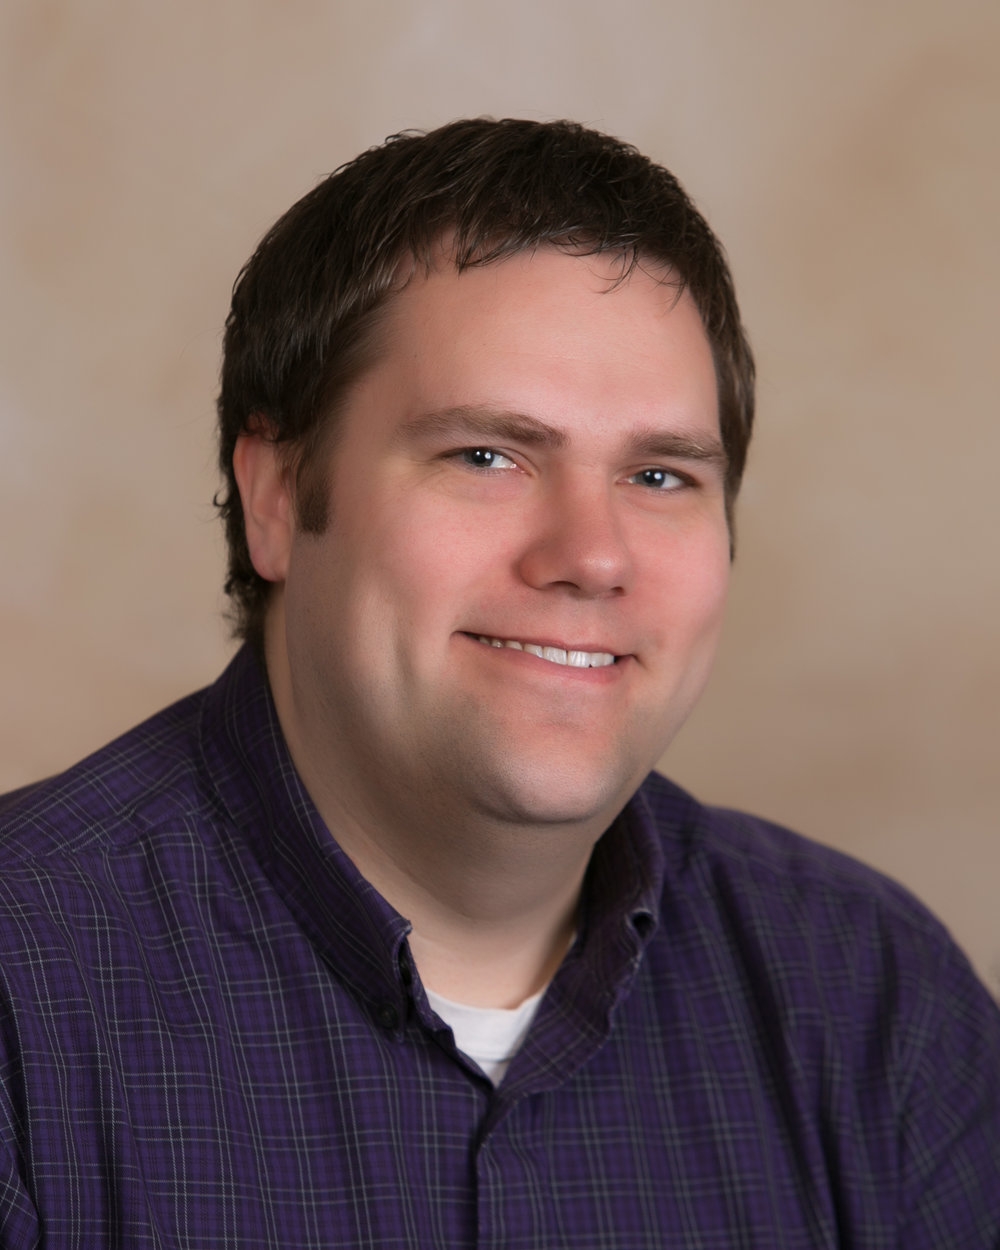 Mr. Lyndon Matson - Office Coordinator